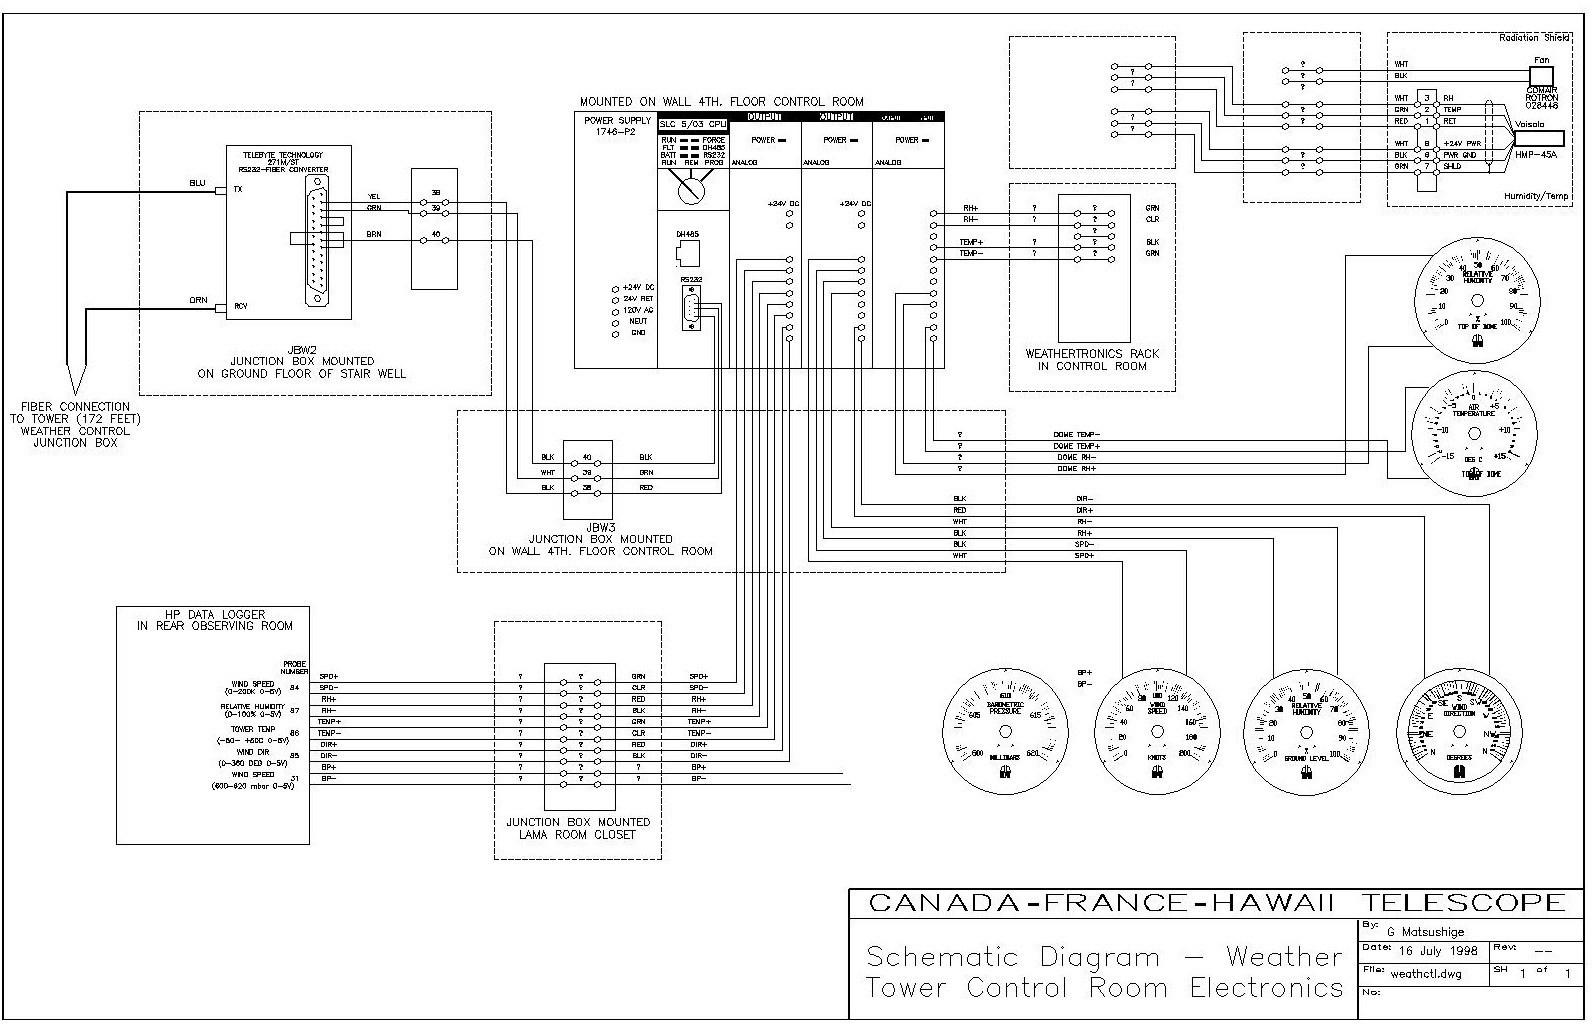 allen bradley reversing motor starter wiring diagram mercruiser water pump 509 bod sample collection pf 40 3 wire snk control on